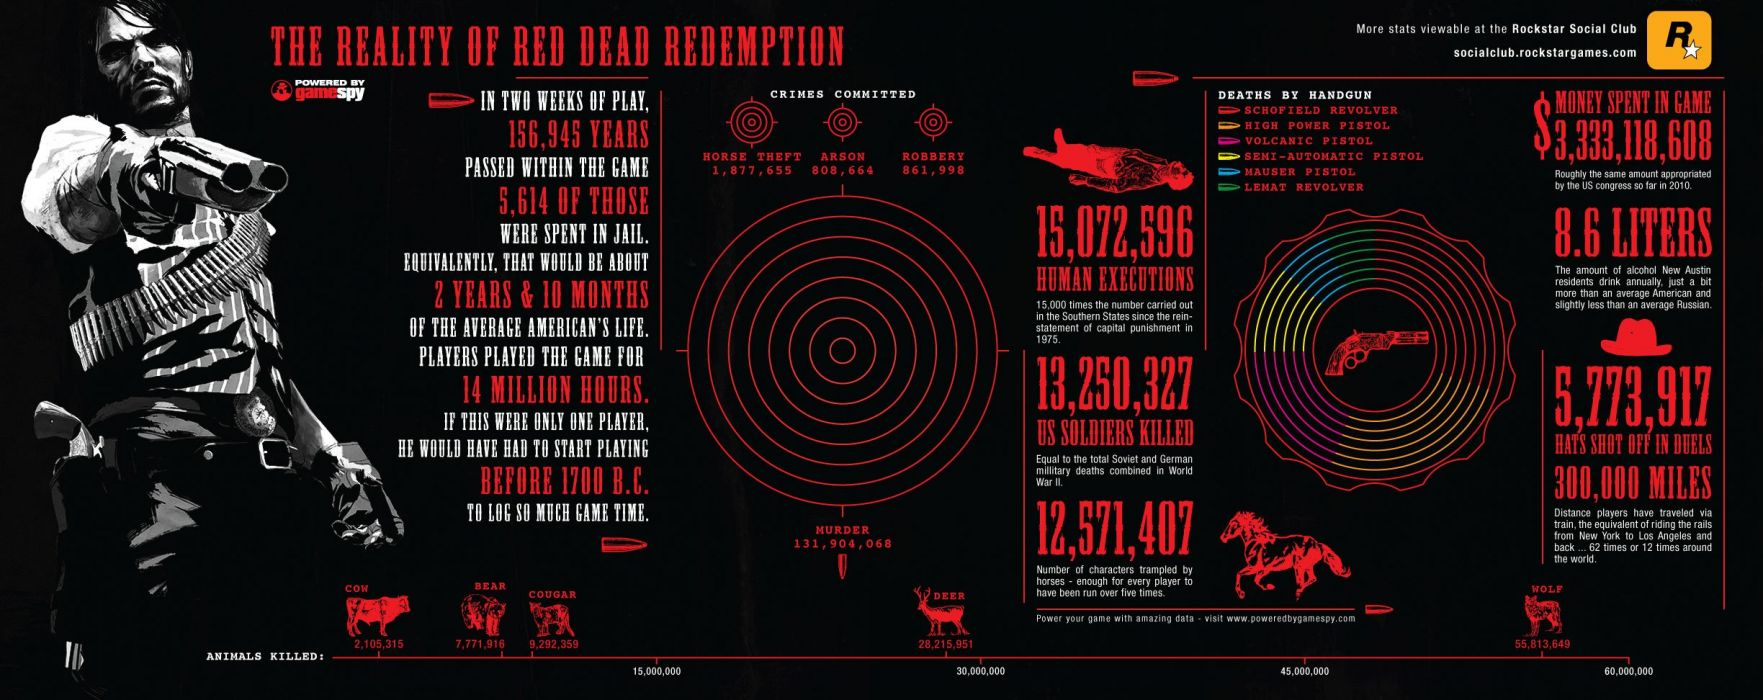 RED DEAD REDEMPTION western action adventure (11) wallpaper